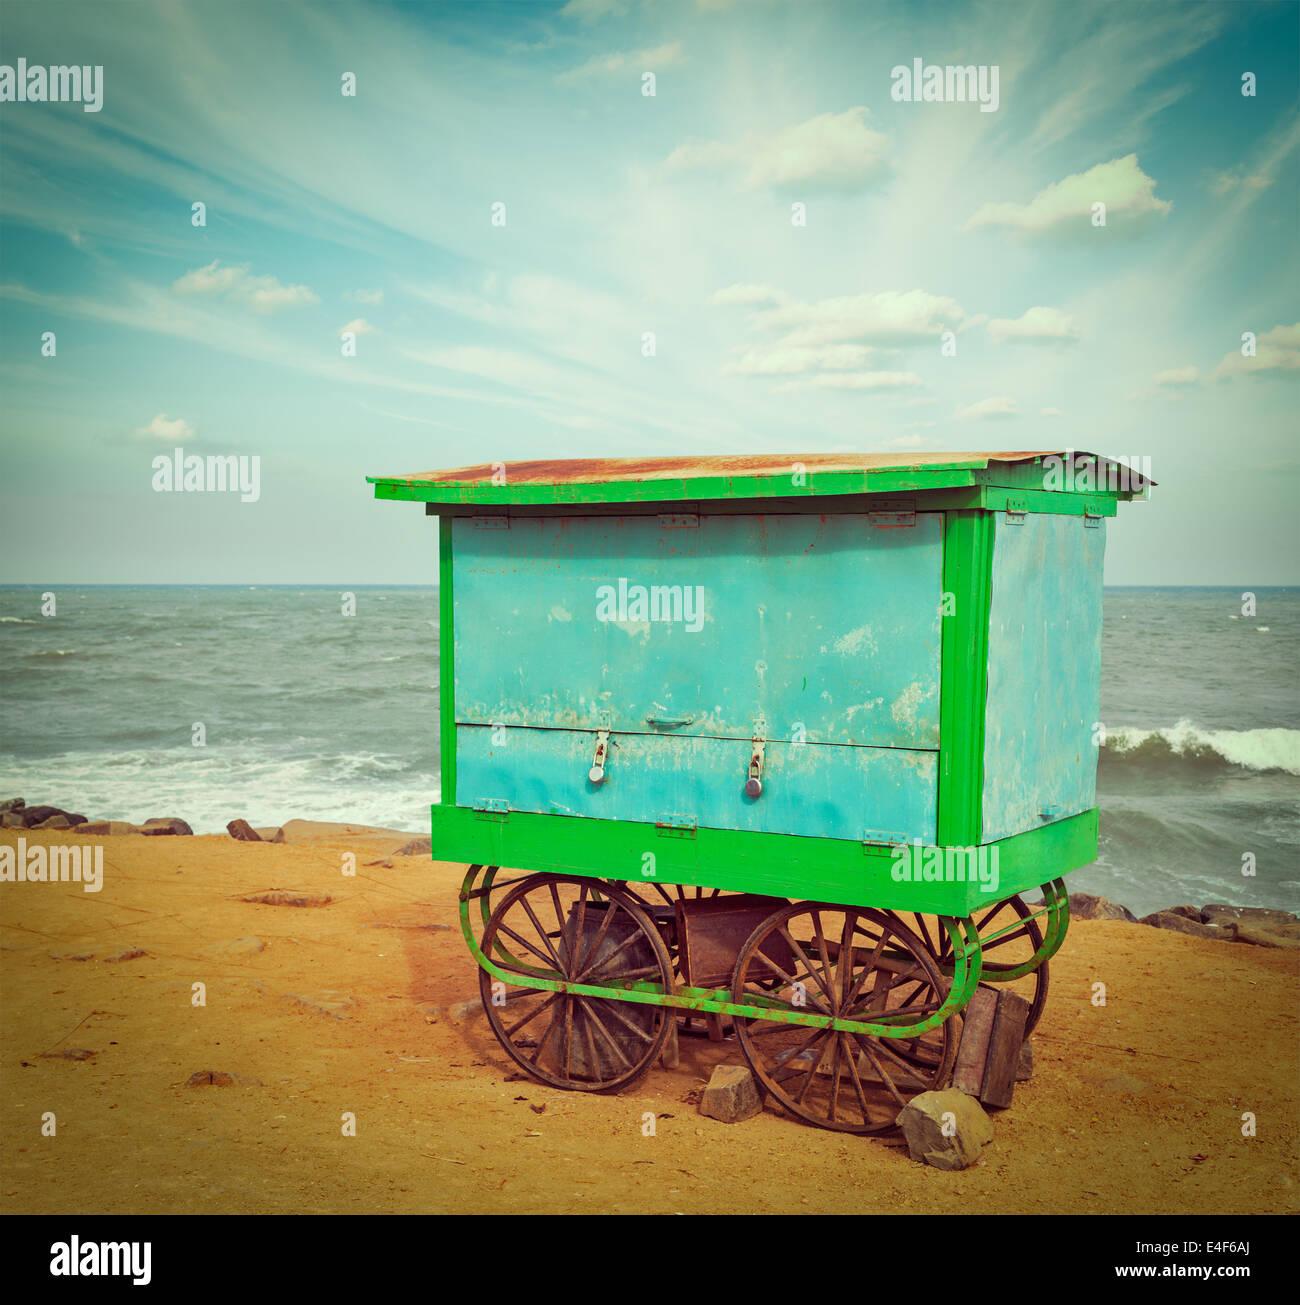 Vintage retro hipster style travel image of cart on beach. Tamil Nadu, India - Stock Image